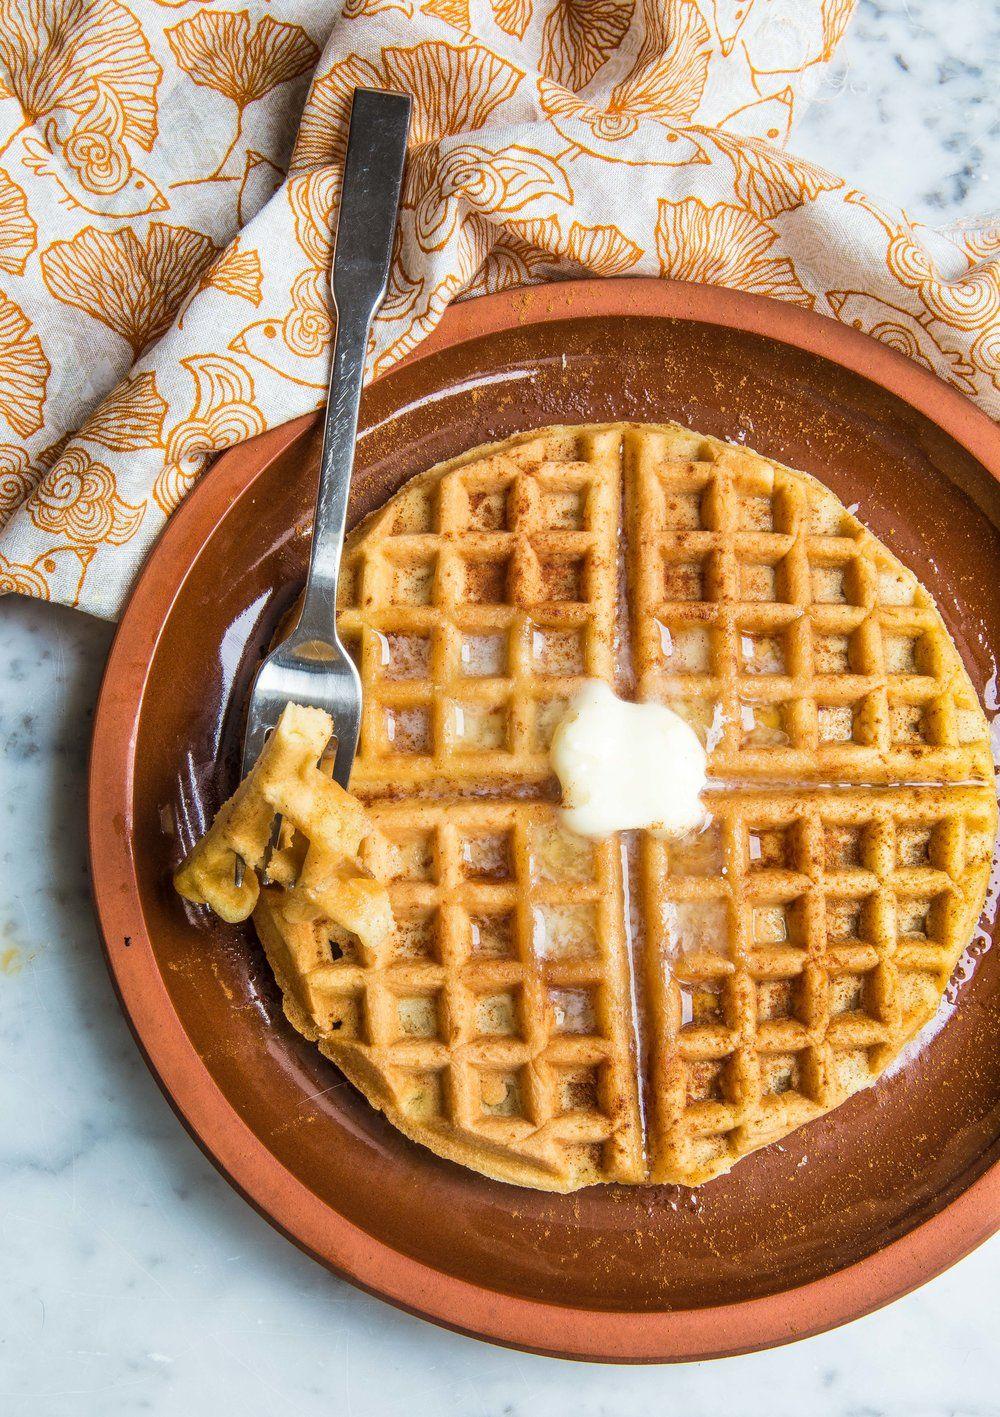 Dairy free fluffy keto pancakes or waffles coconutgrain